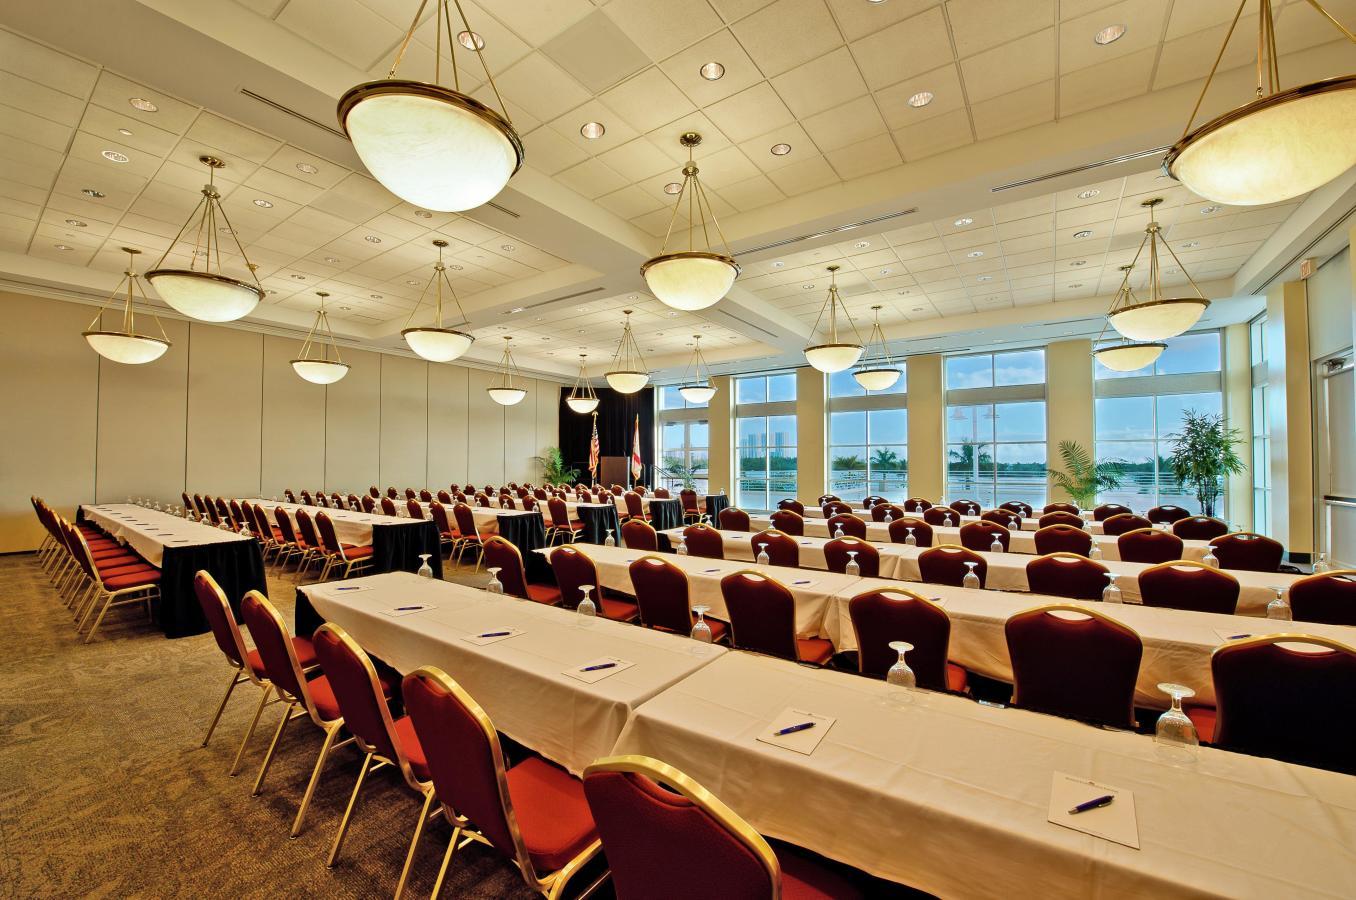 Bayview Grand Ballroom - over 5000 sq.ft